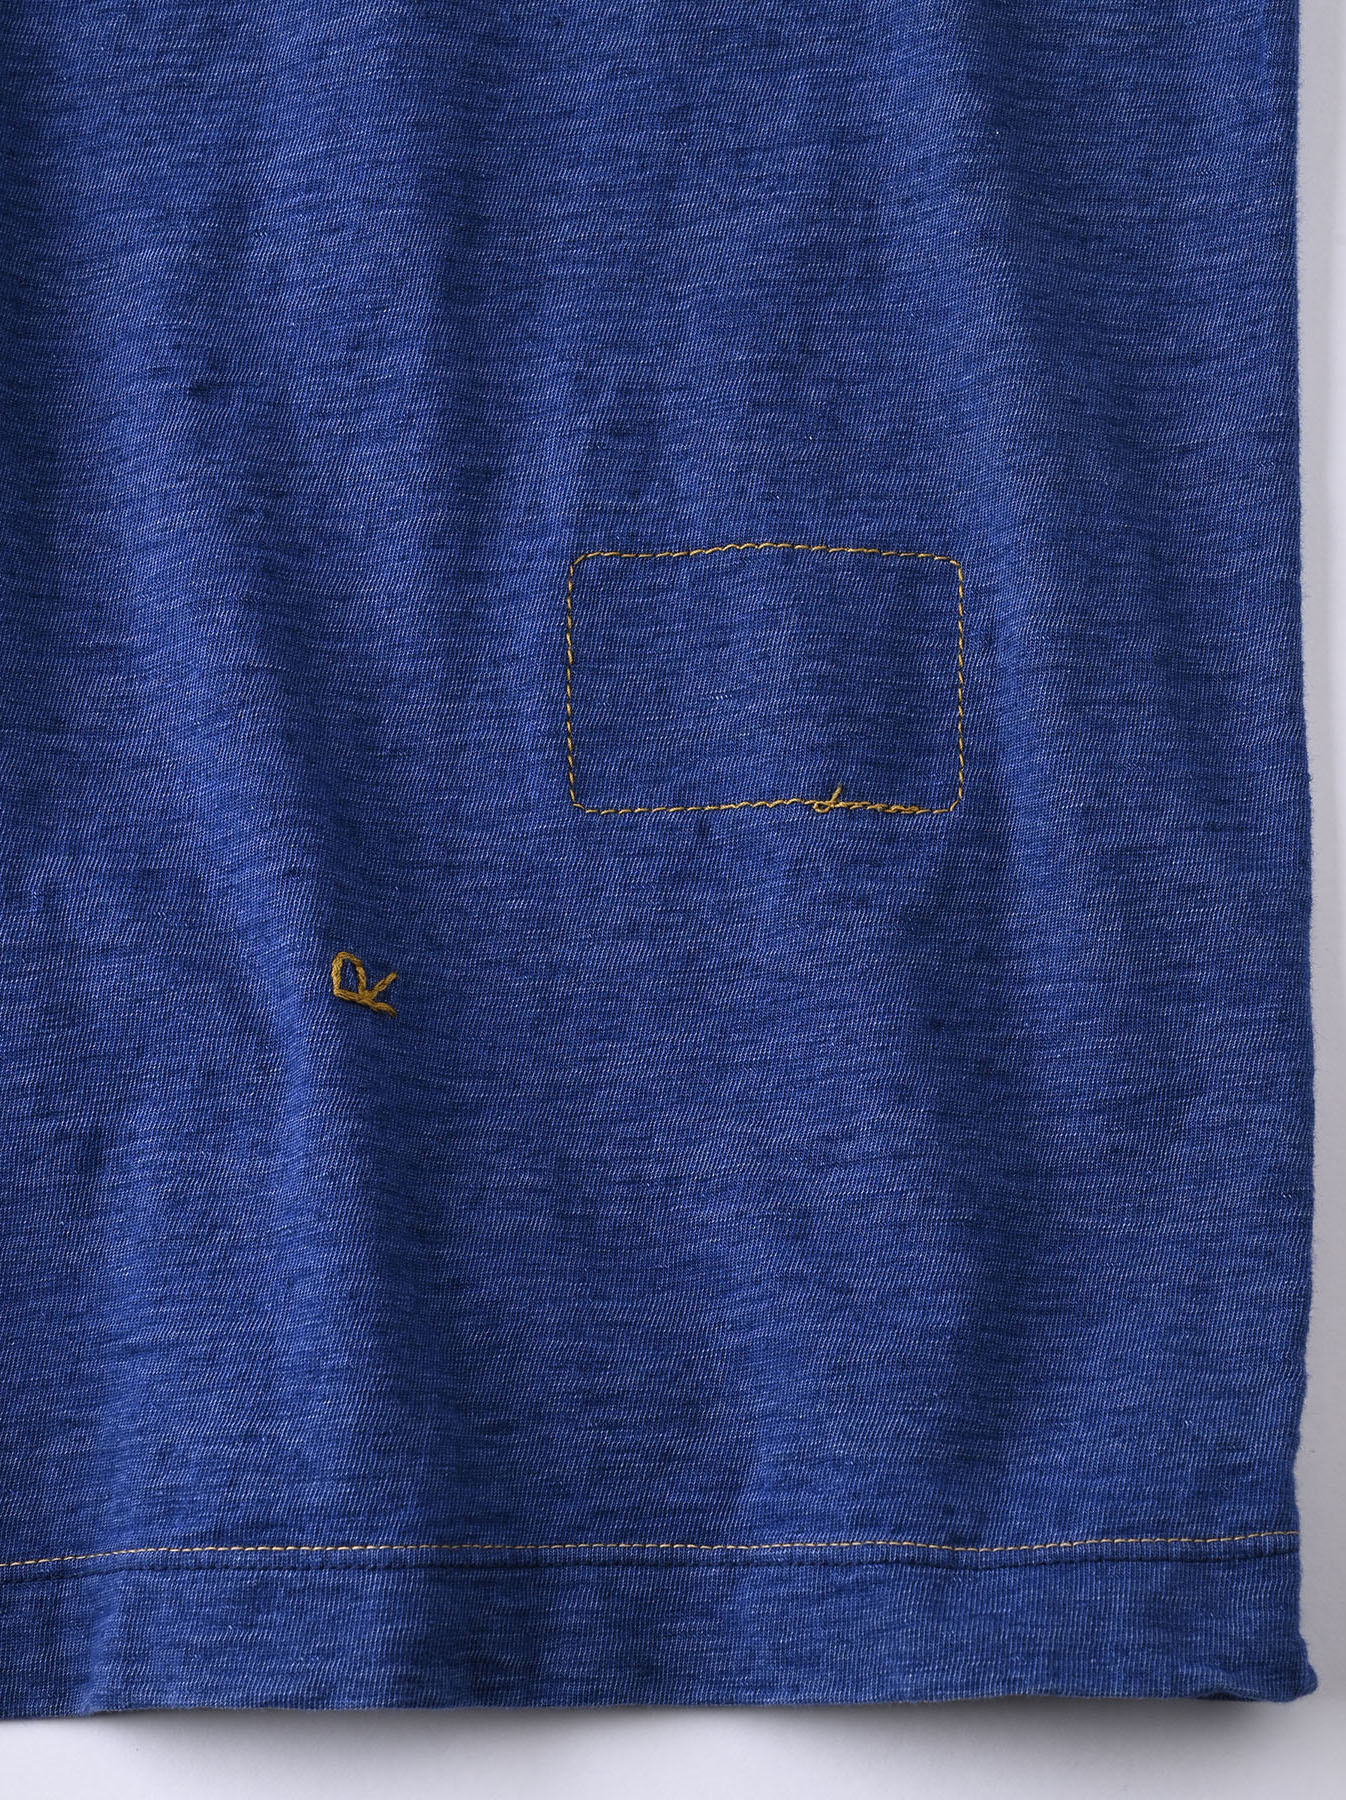 Distressed Indigo Ukiyo de Surf 908 Ocean T-shirt (0621)-12